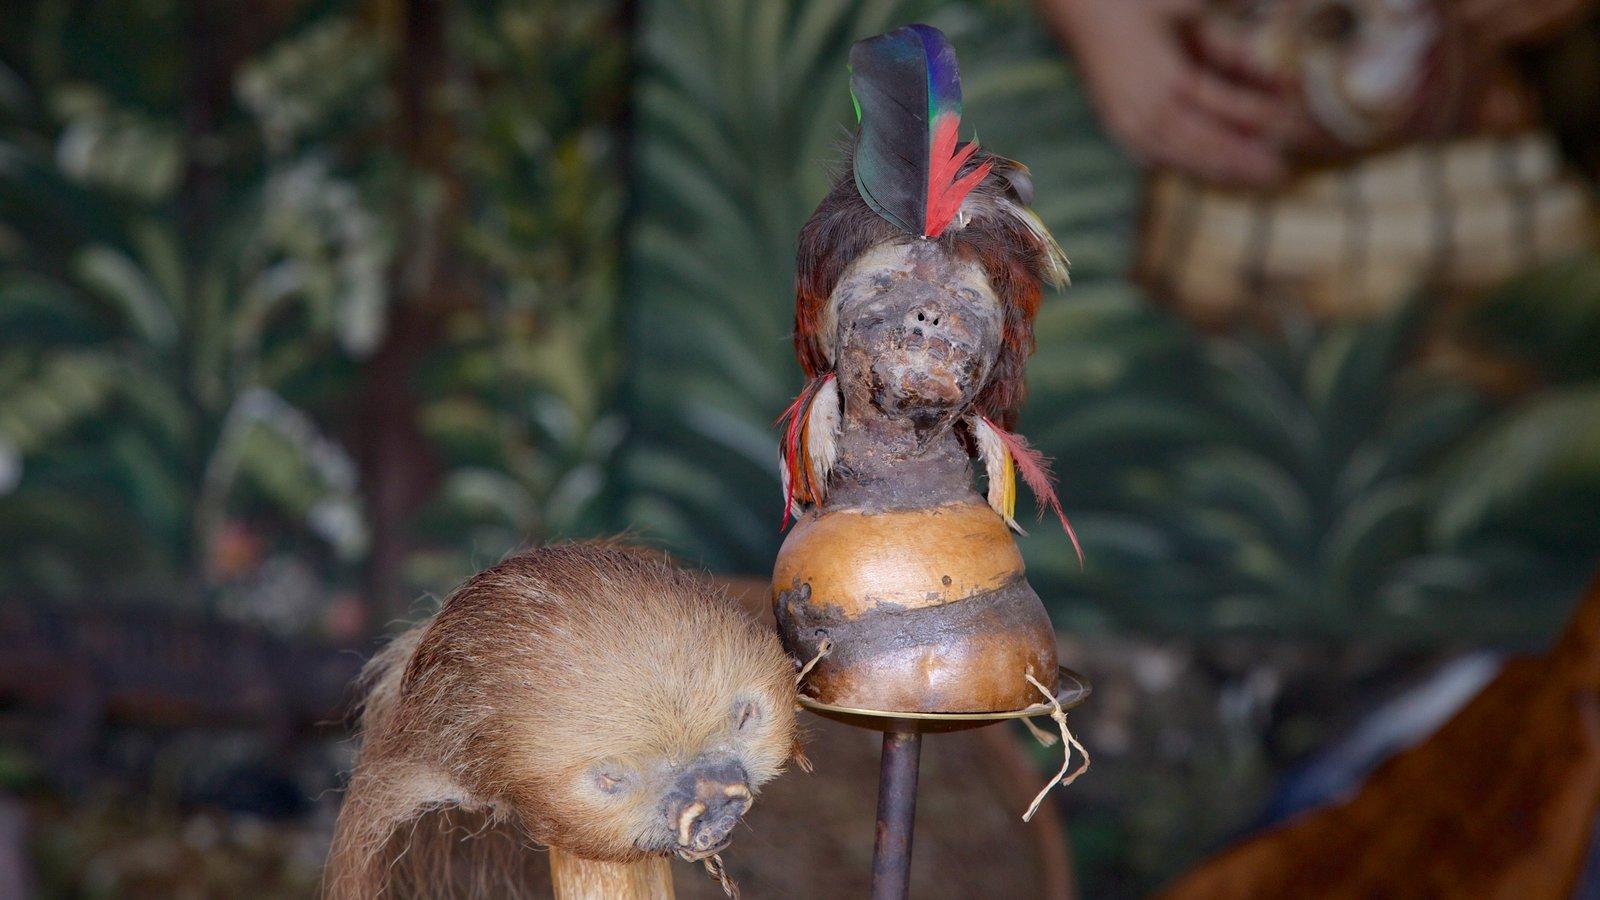 Museo Solar Intiñan que inclui vistas internas e cultura nativa